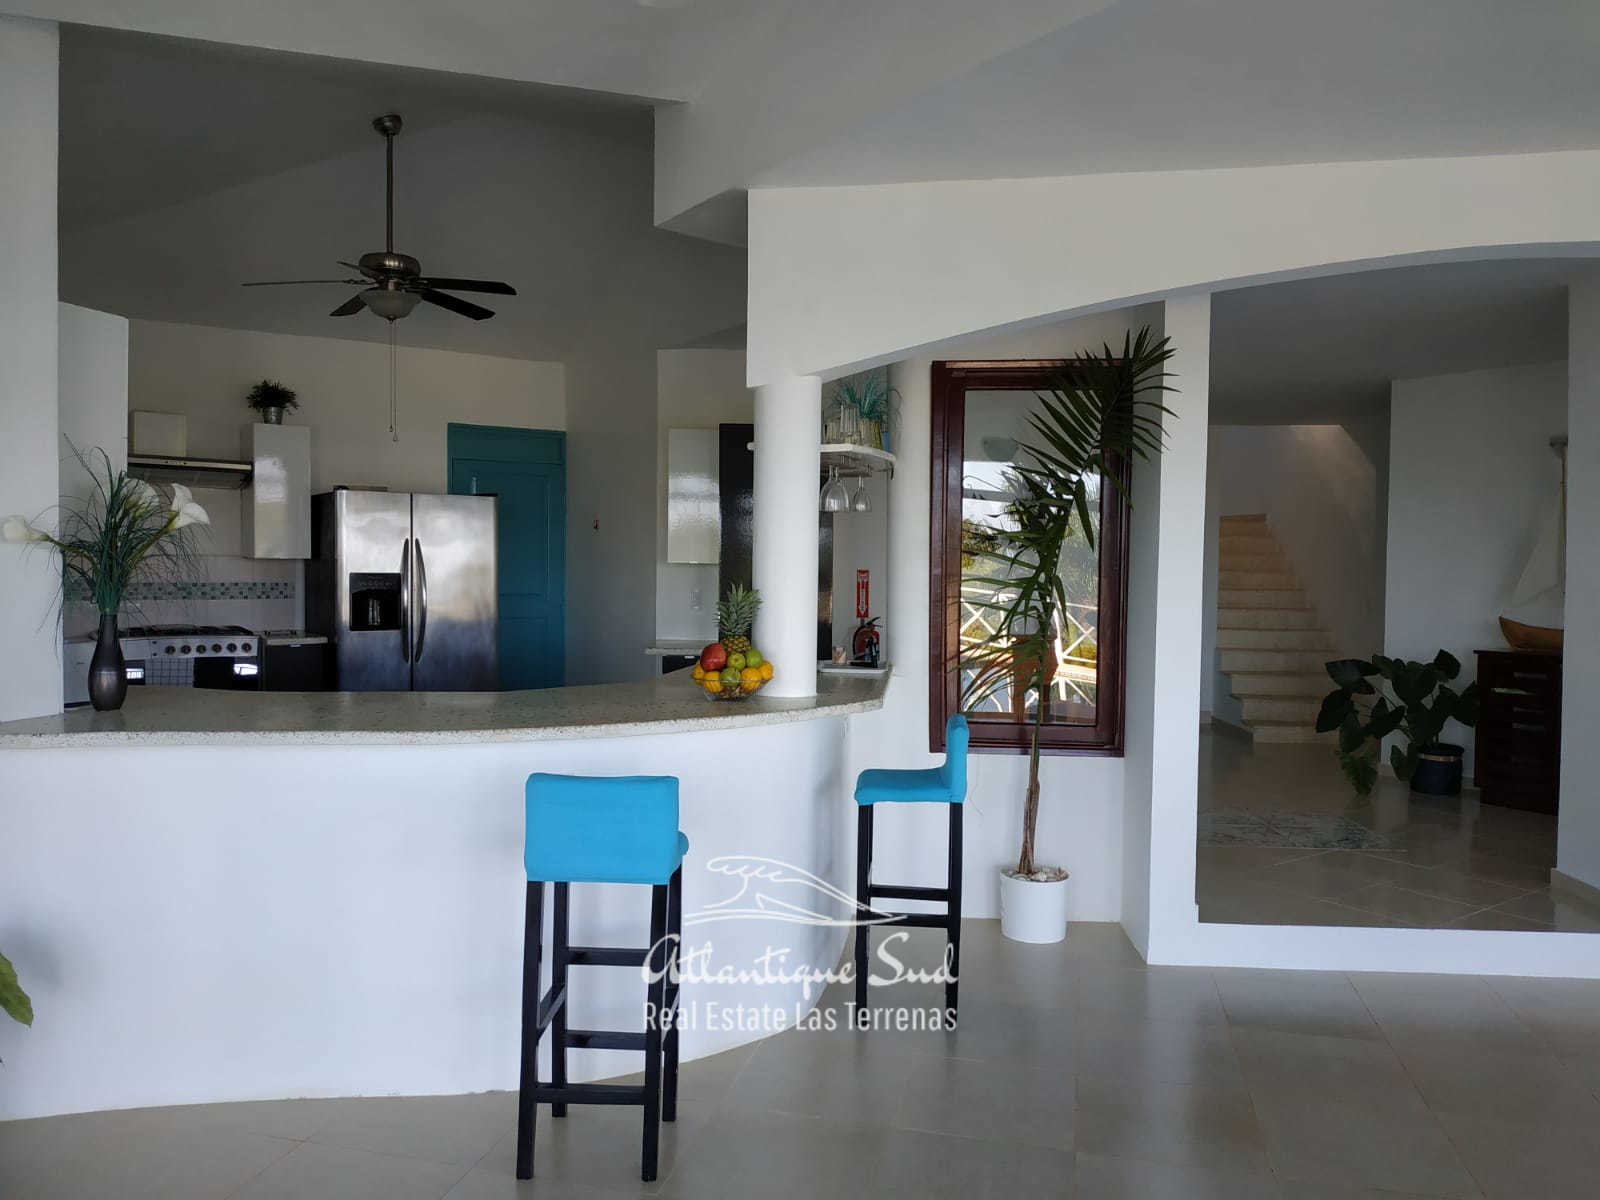 Villa for sale on hill in Las Terrenas Dominican republic34.jpg